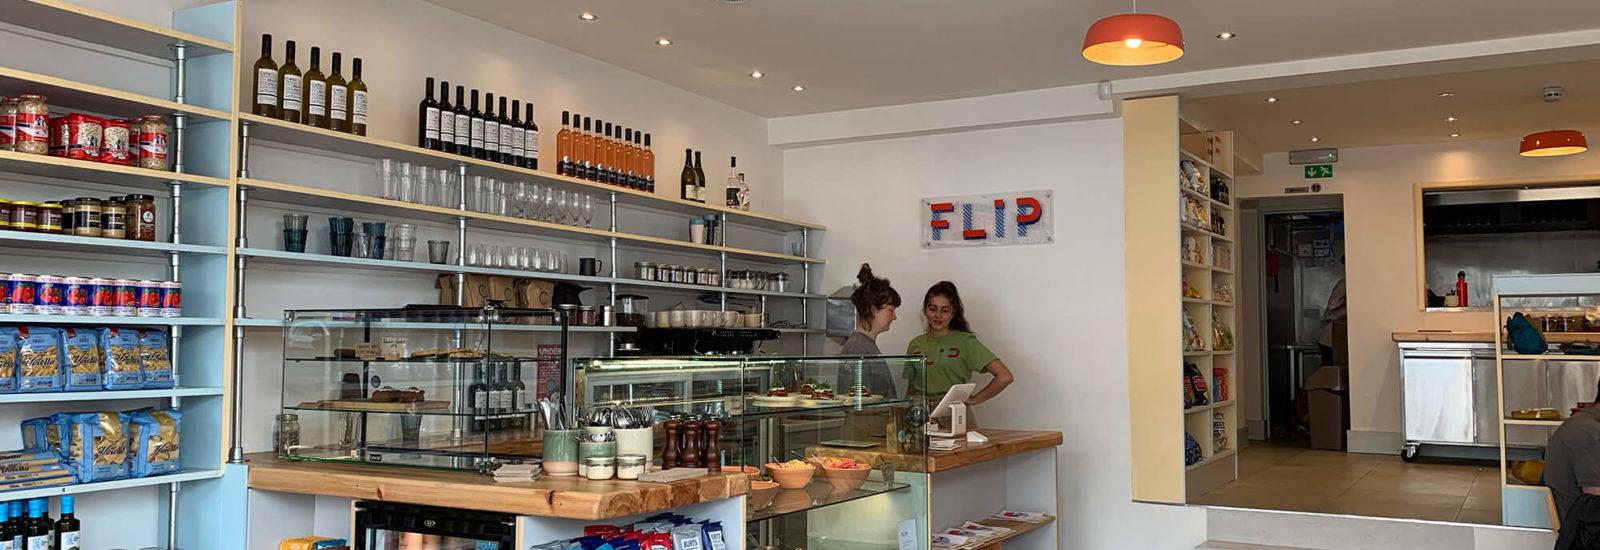 Image of FLIP Deli & Cafe